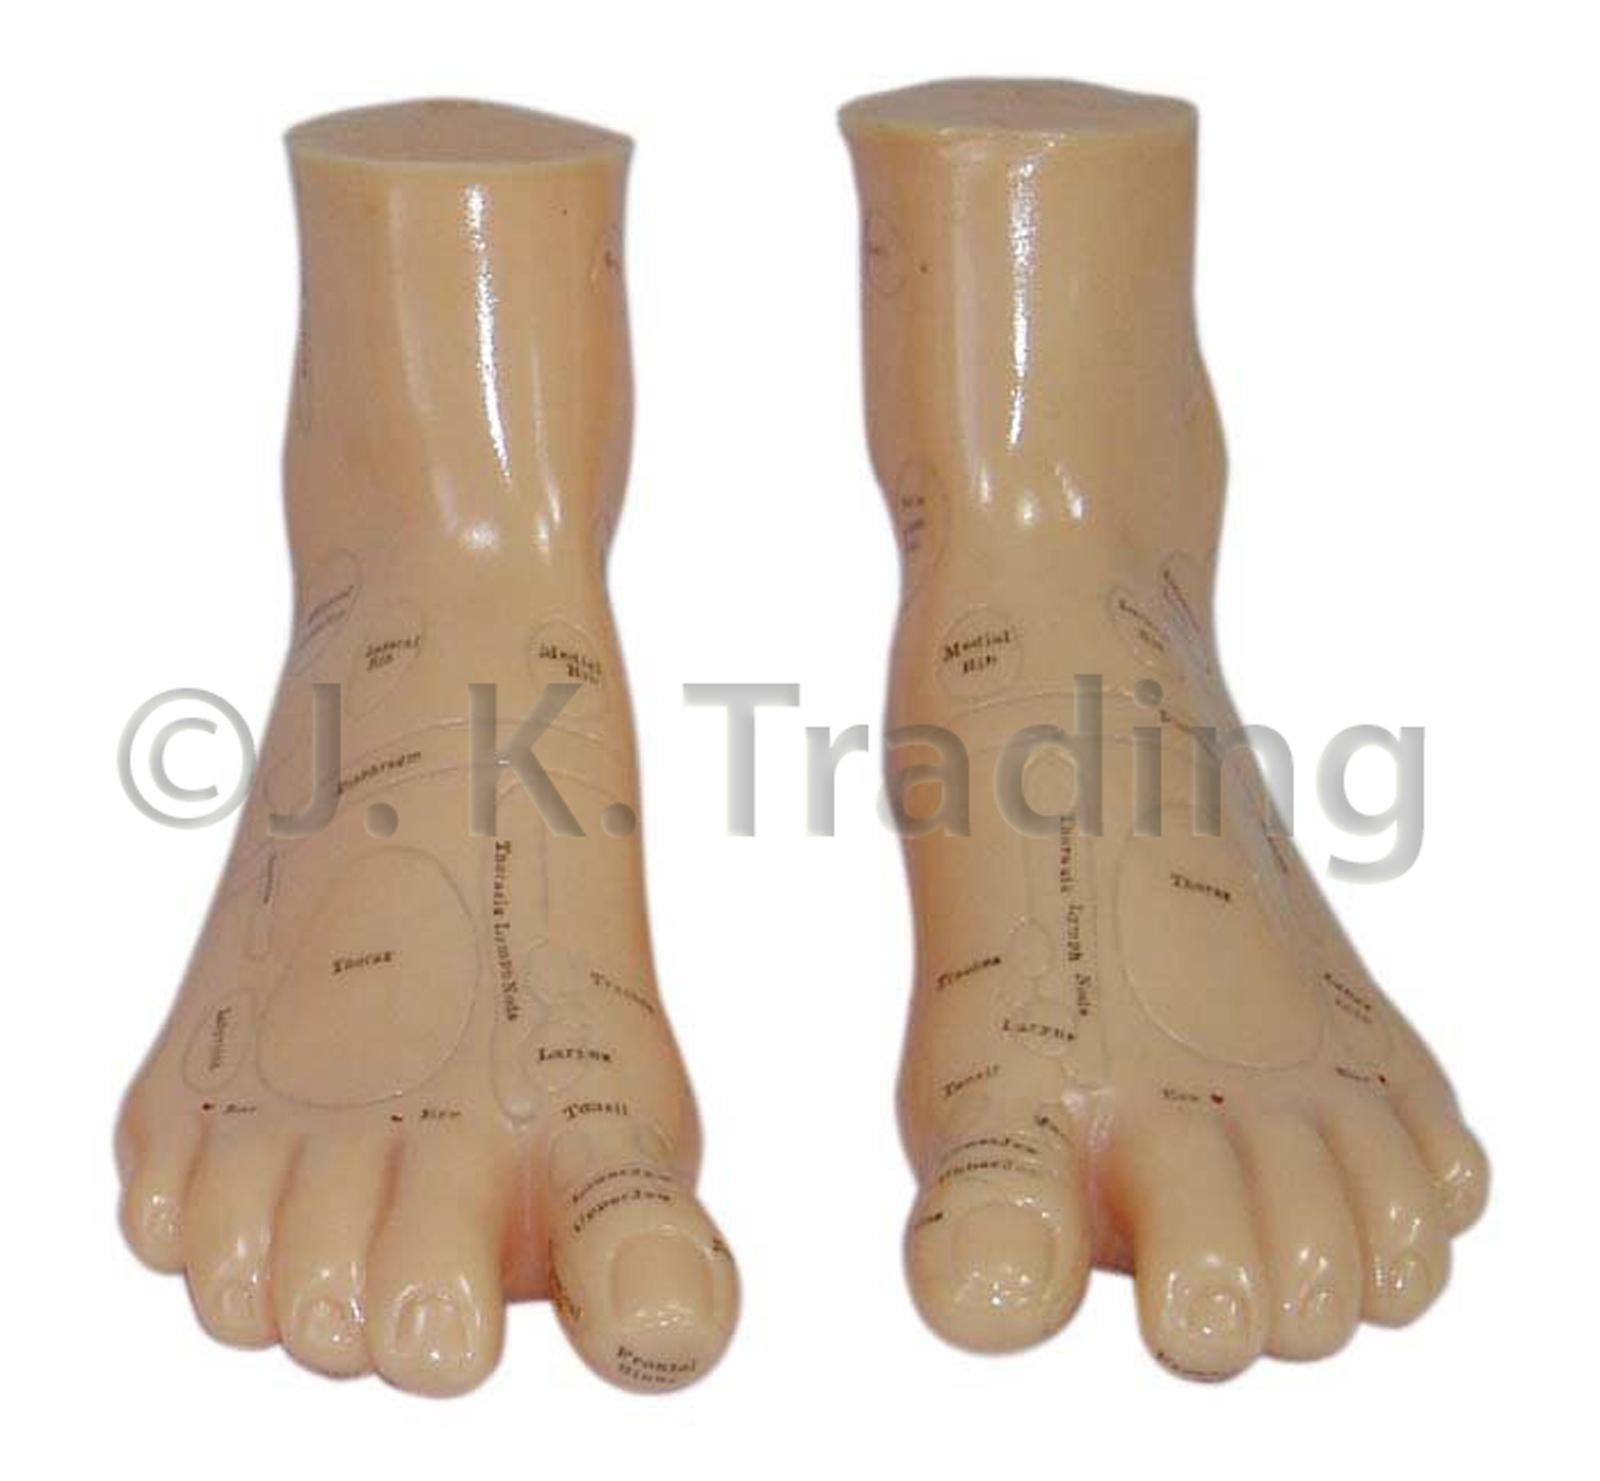 Foot Anatomy Model Marked Massage Areas